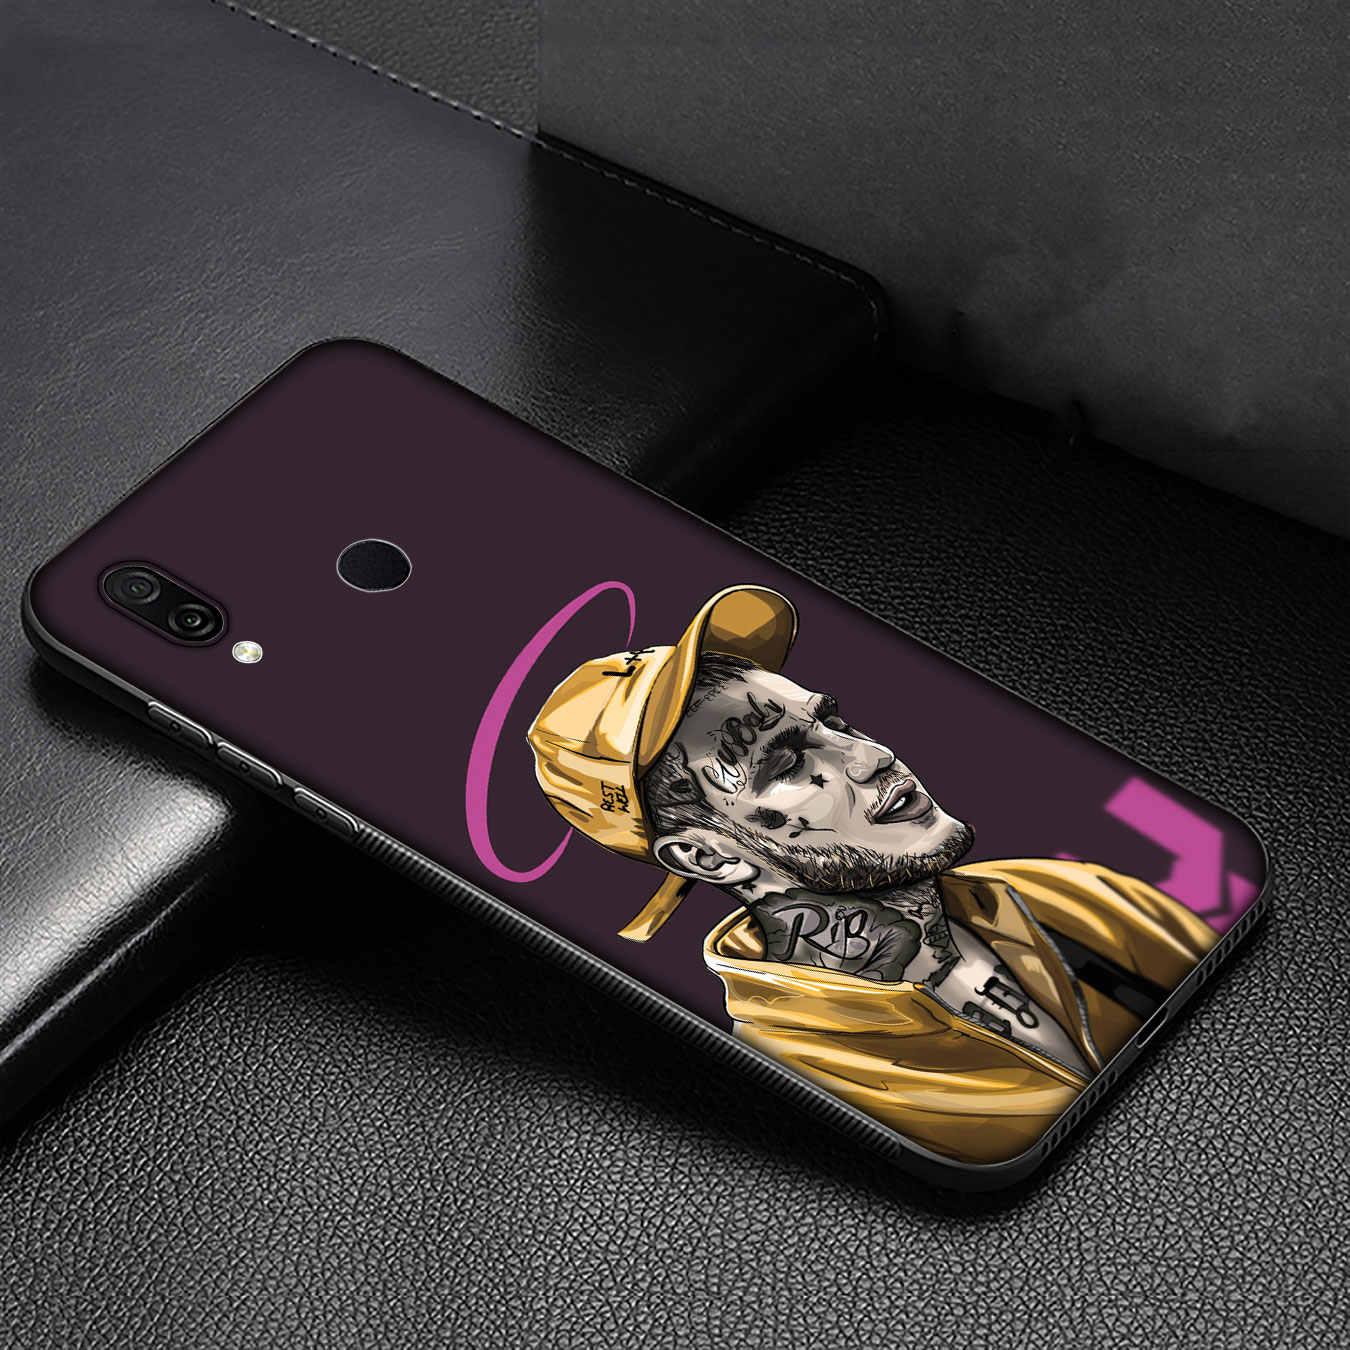 Lil Peep Lil Bo Peep Pop Mềm Mại Ốp Lưng Dẻo Silicone Huawei Y9 Y7 Y6 Prime 2019 Danh Dự Xem 20 8C 8X8 9 9X10 Lite 7C 7X 7A Pro